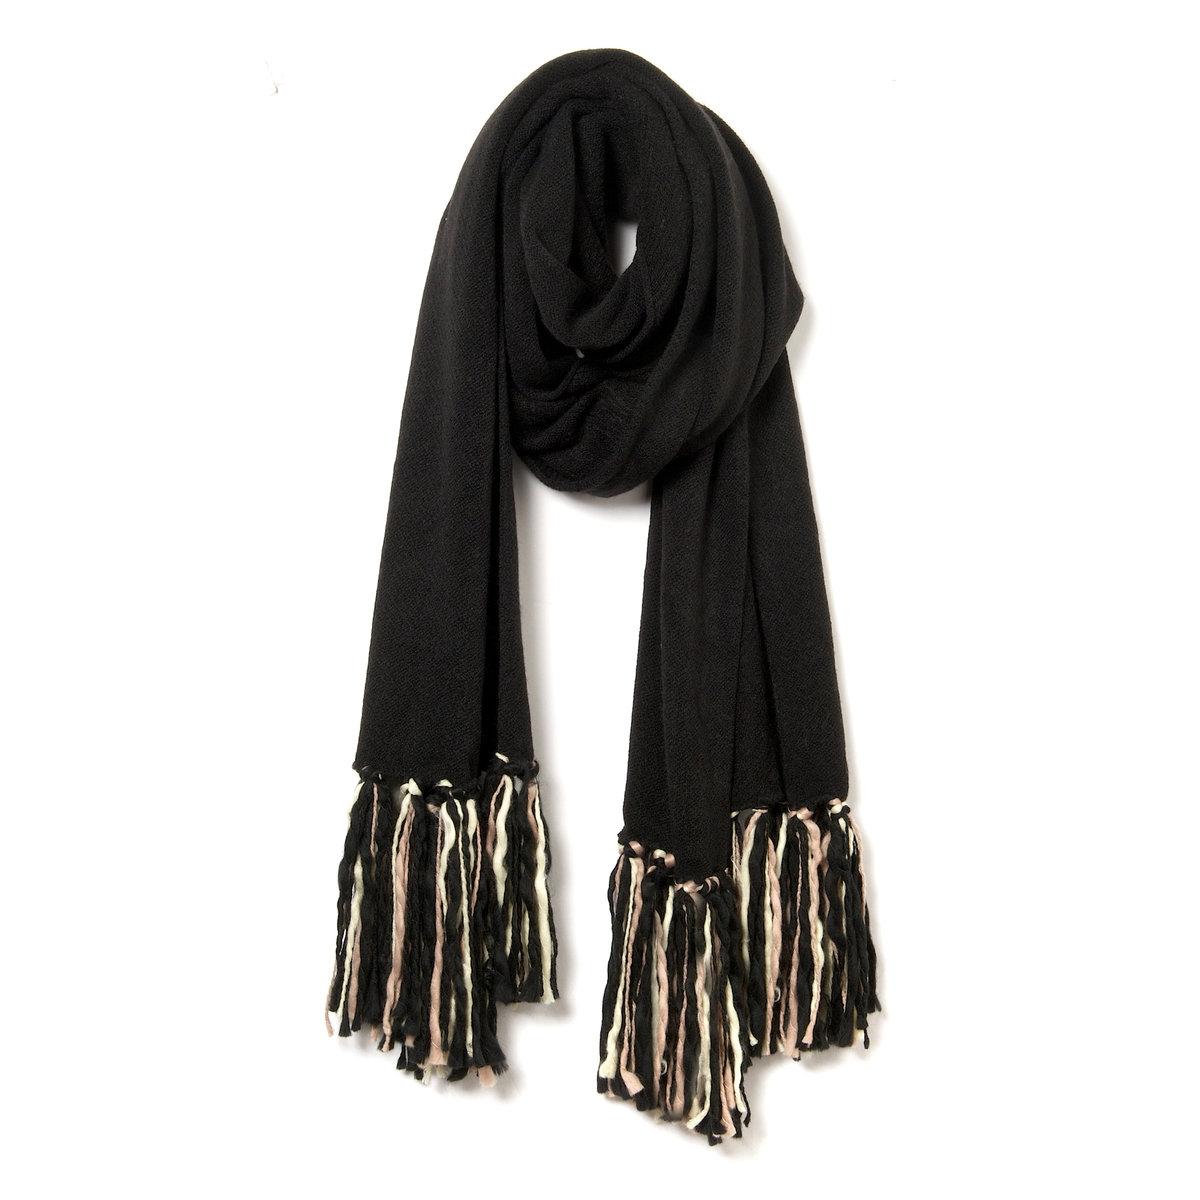 Теплый шарф с бахромой - SOFT GREY от La Redoute